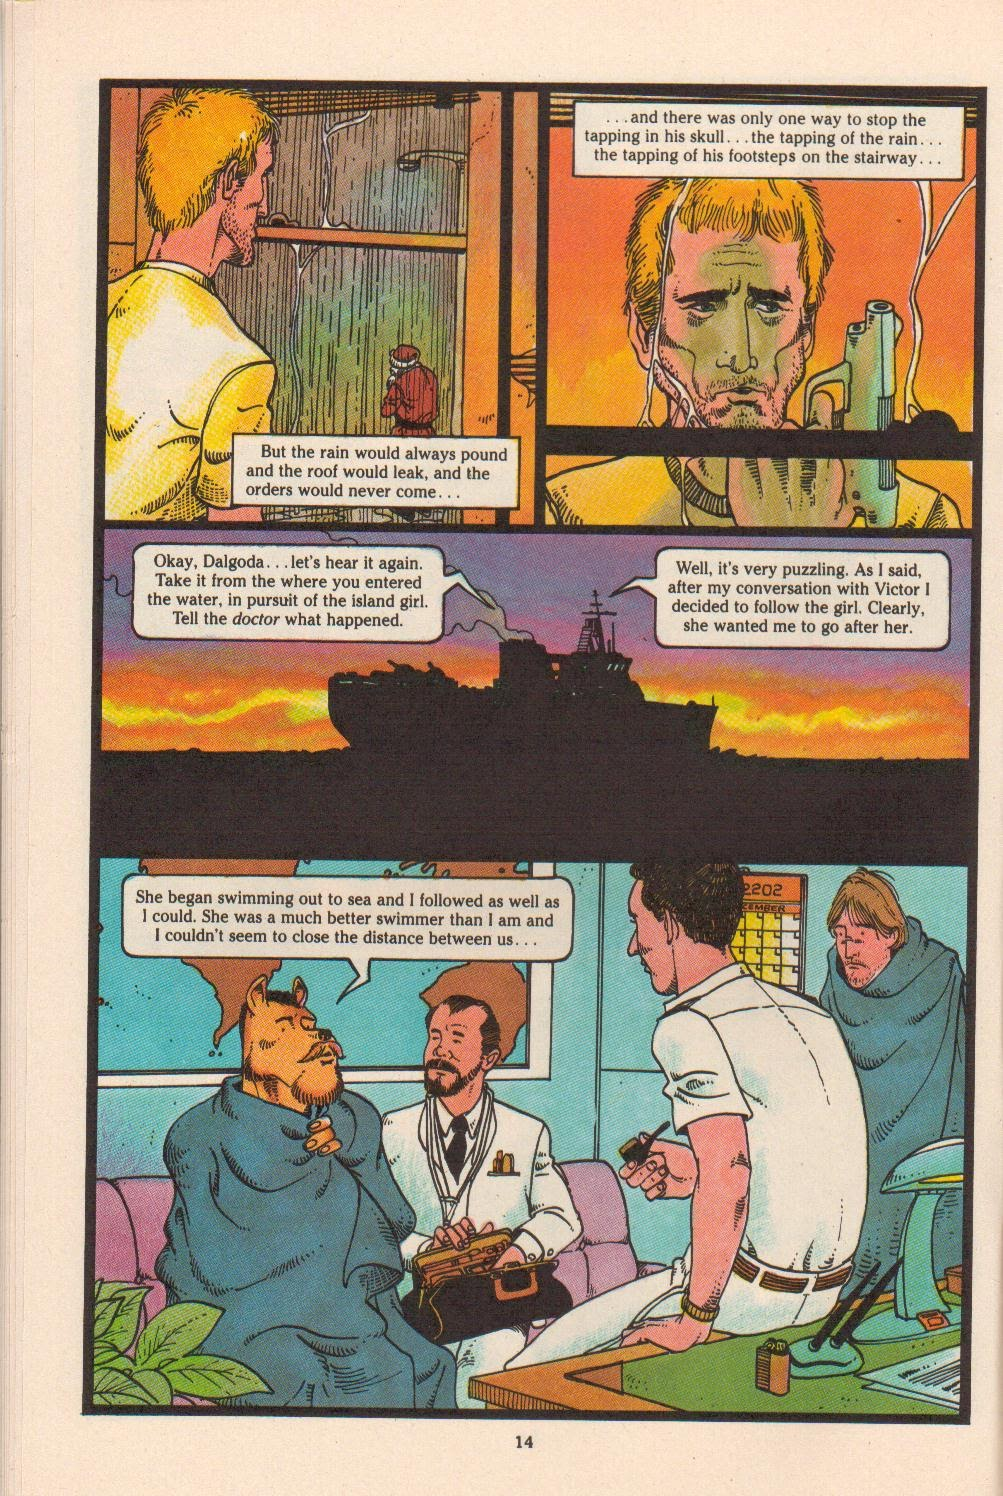 Read online Dalgoda comic -  Issue #4 - 16